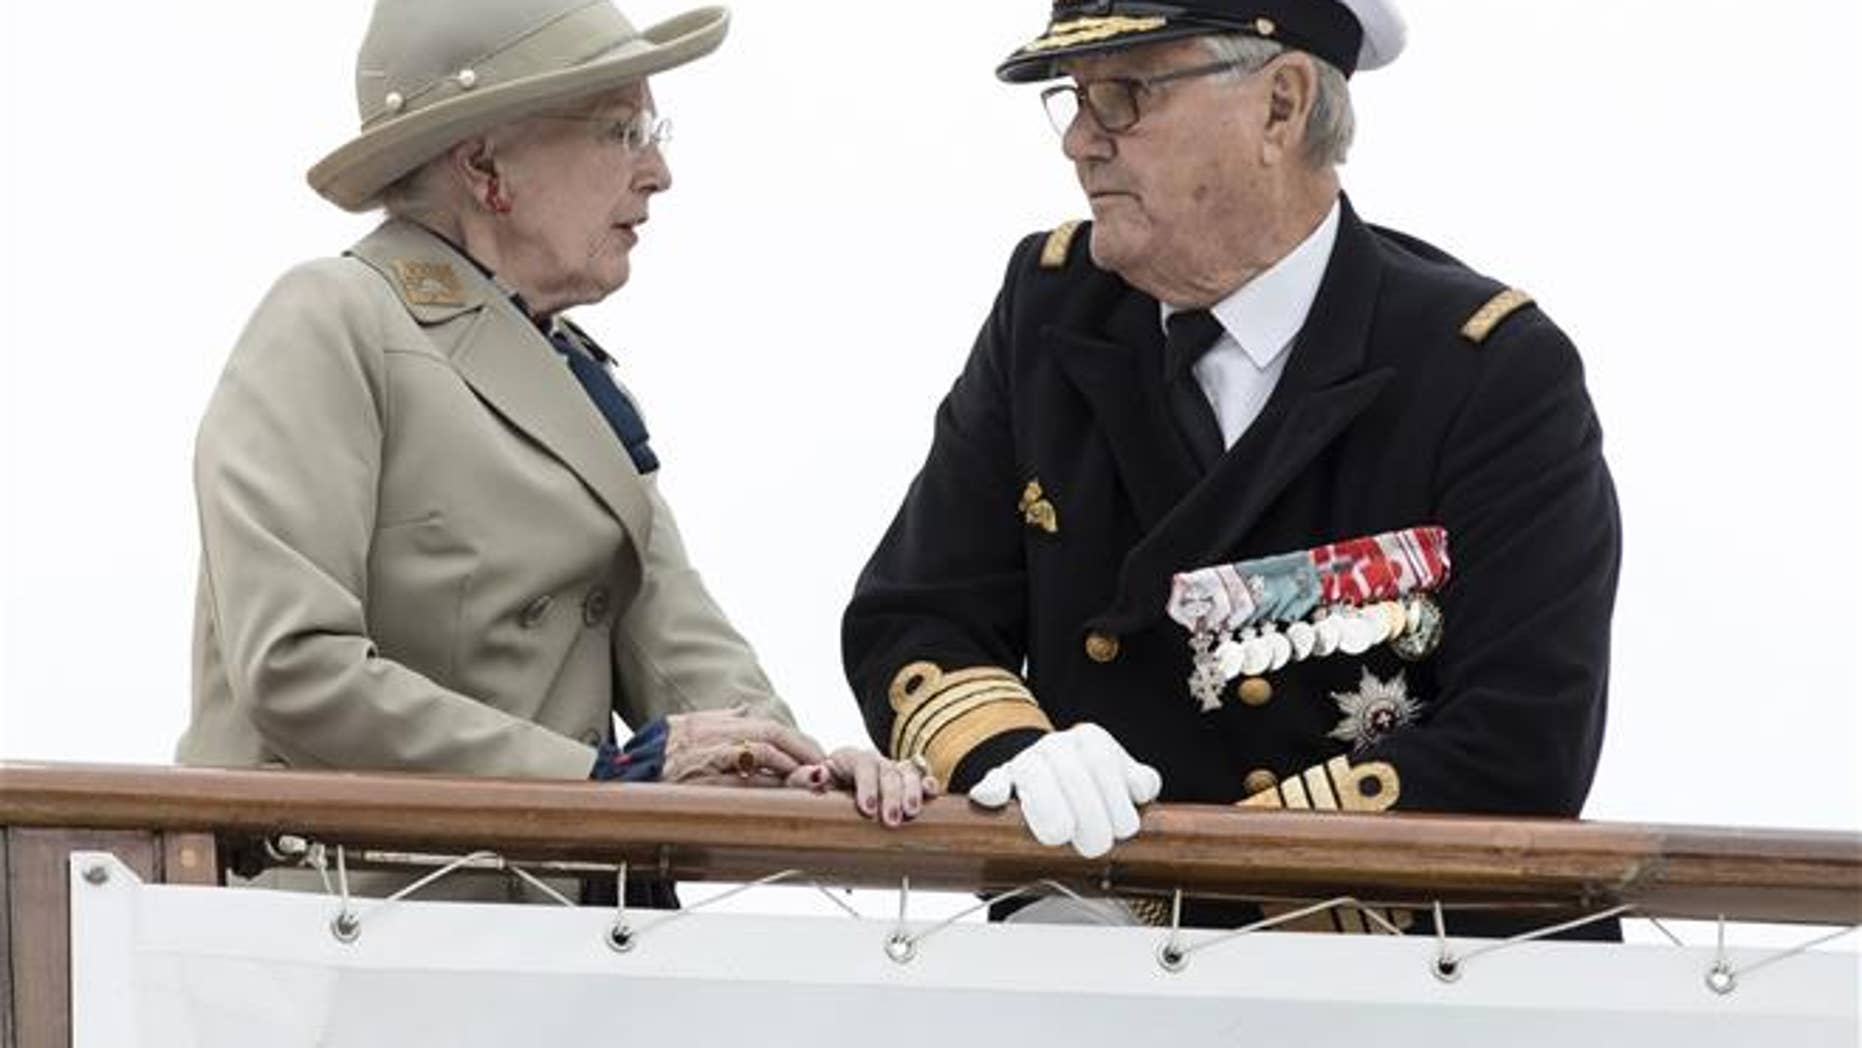 Danish Queen Margrethe and Prince Henrik arrive at Aarhus Harbour.